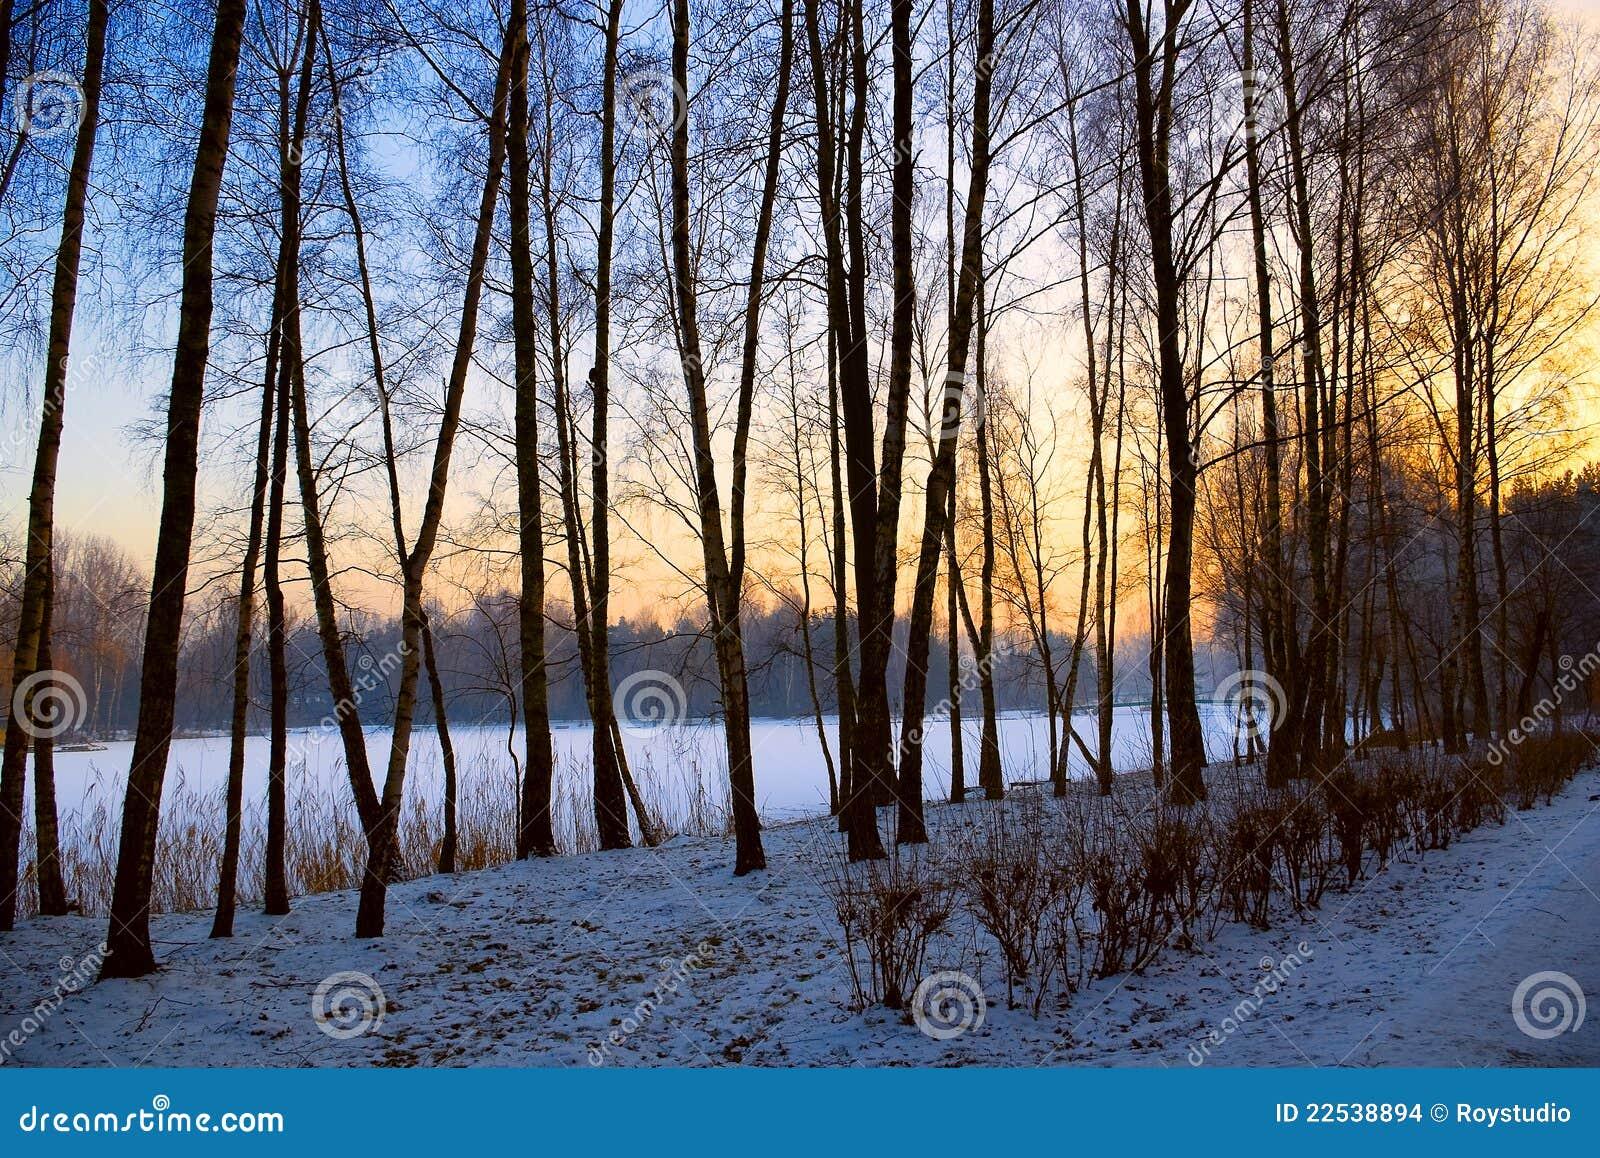 winter sunset landscape snow garden tree view stock